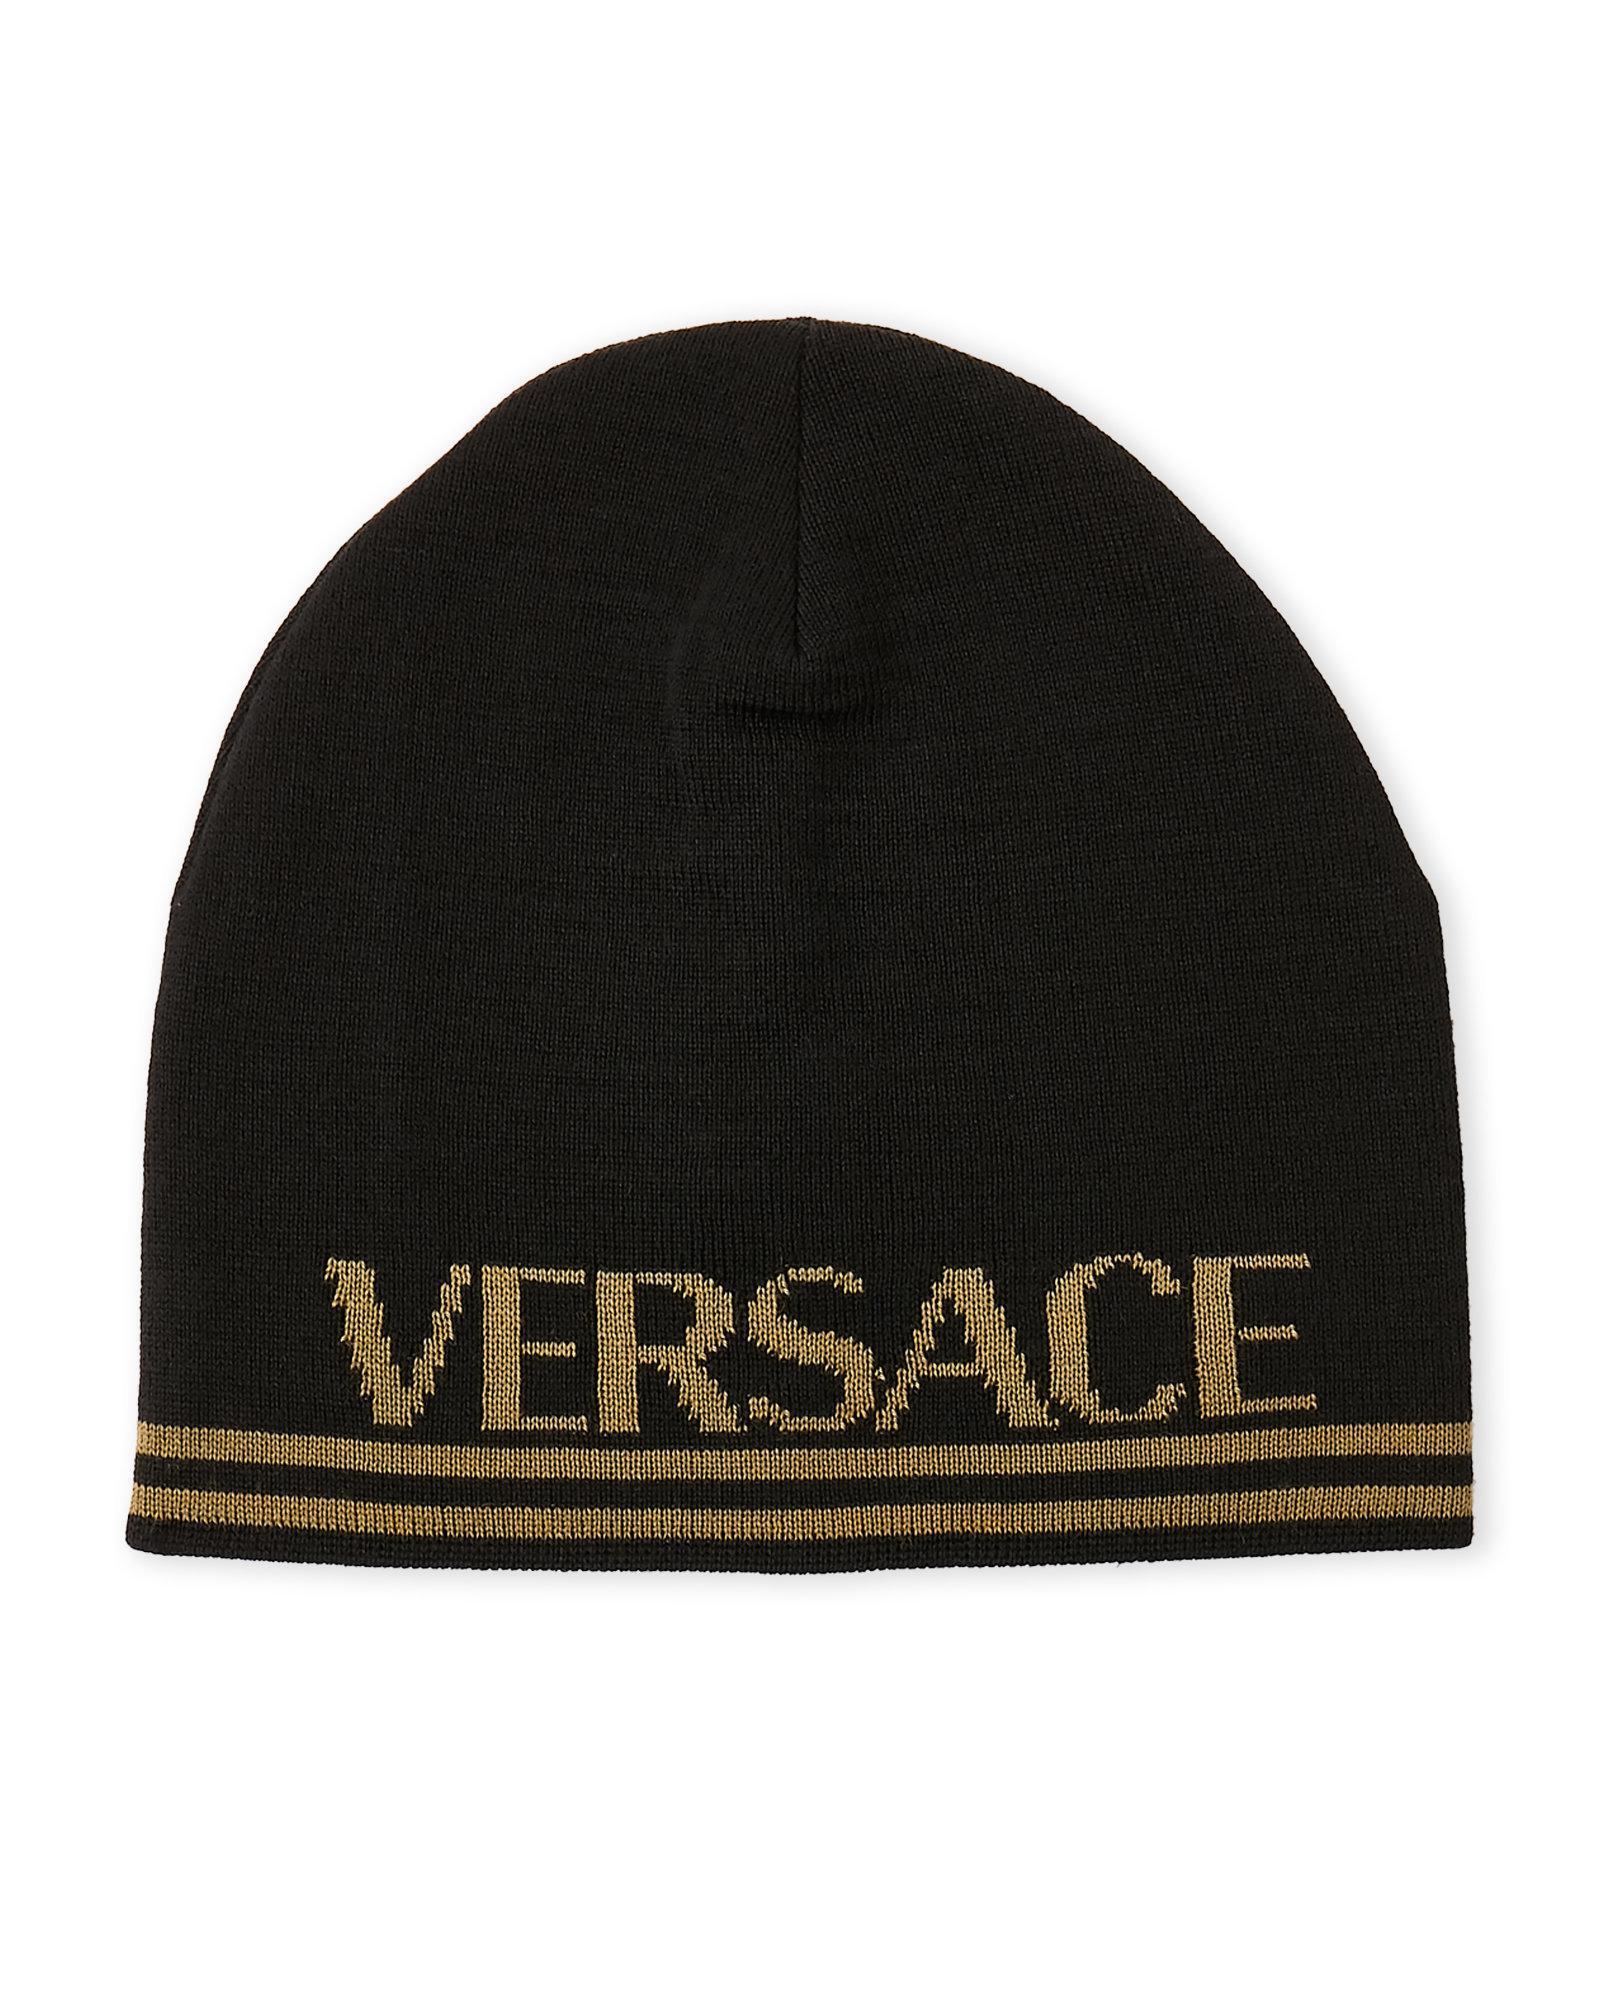 Lyst - Versace Logo Beanie in Black for Men 34d83f1537d